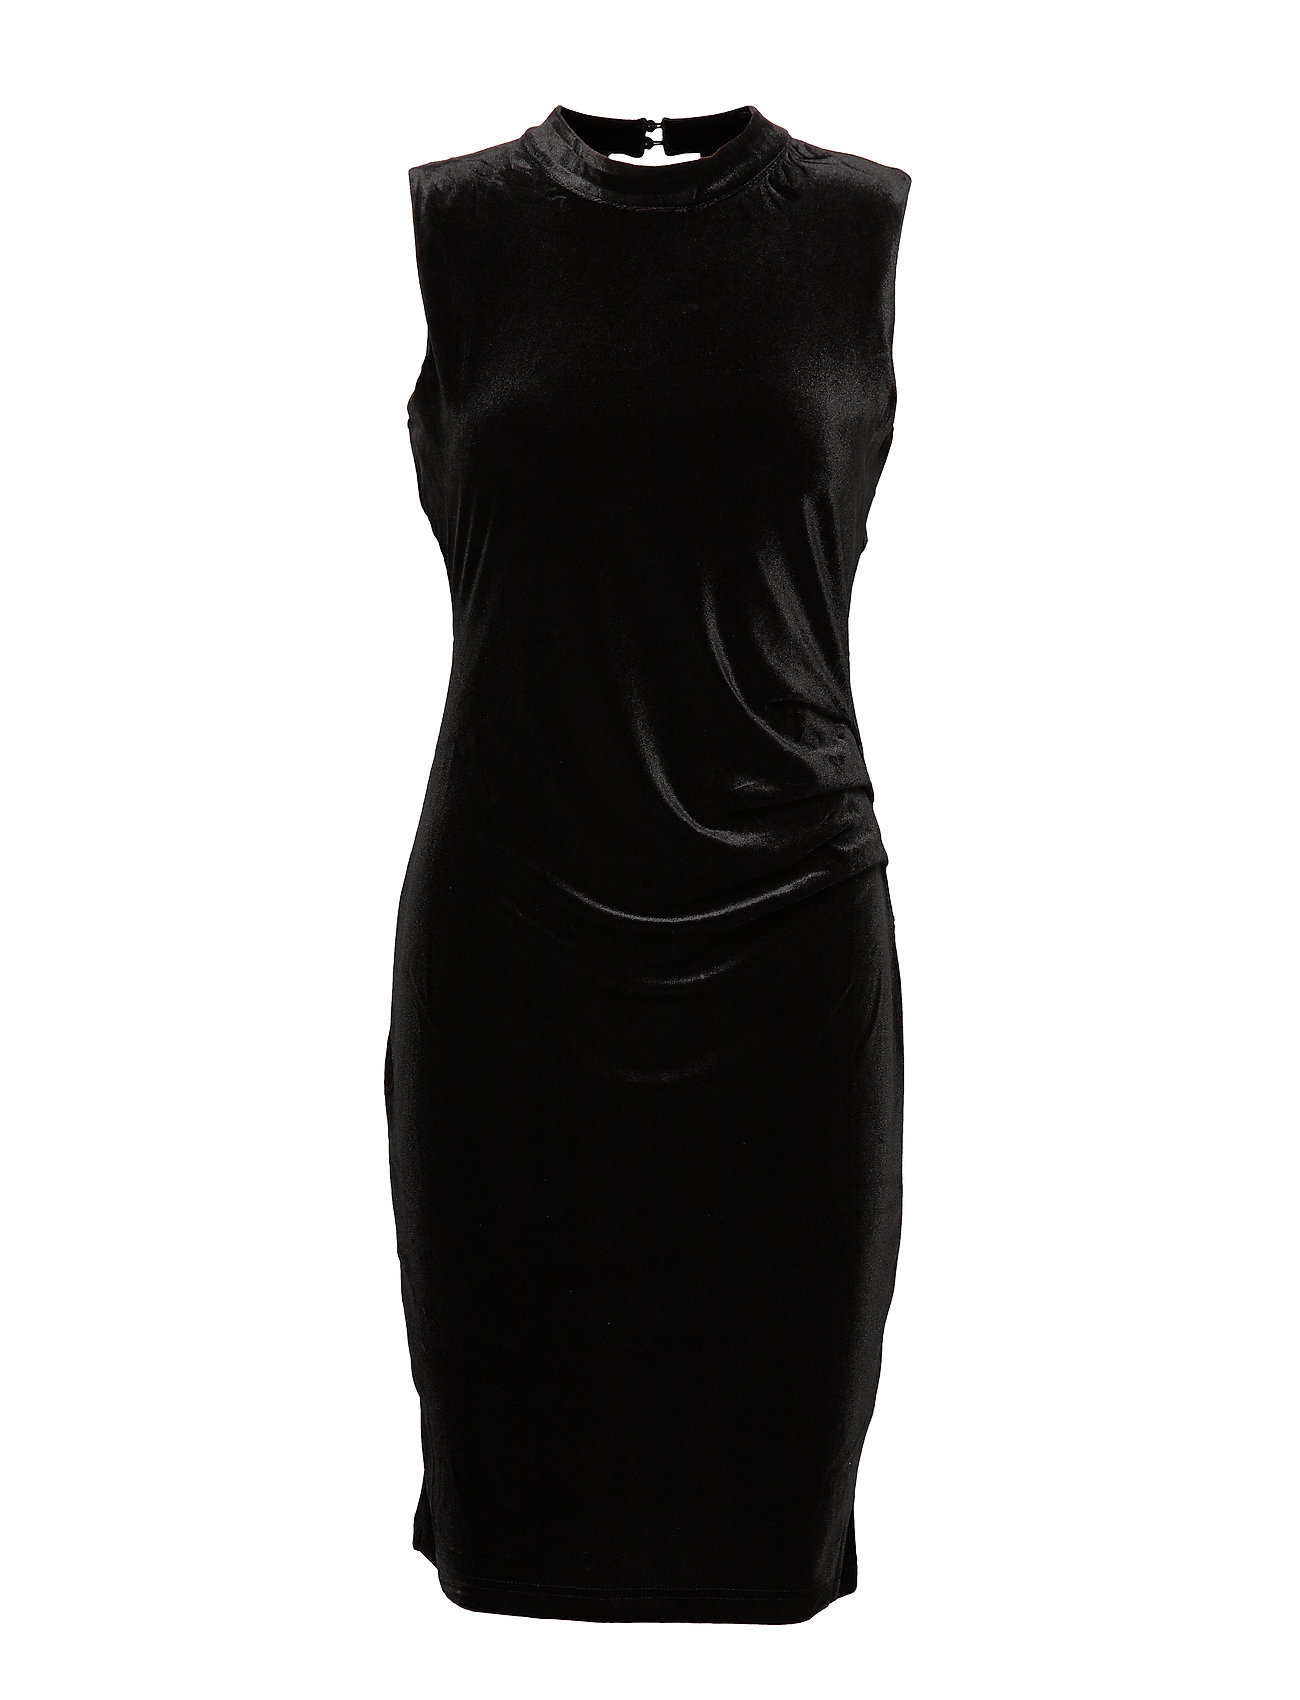 Kaffe Valentine India Dress - BLACK DEEP